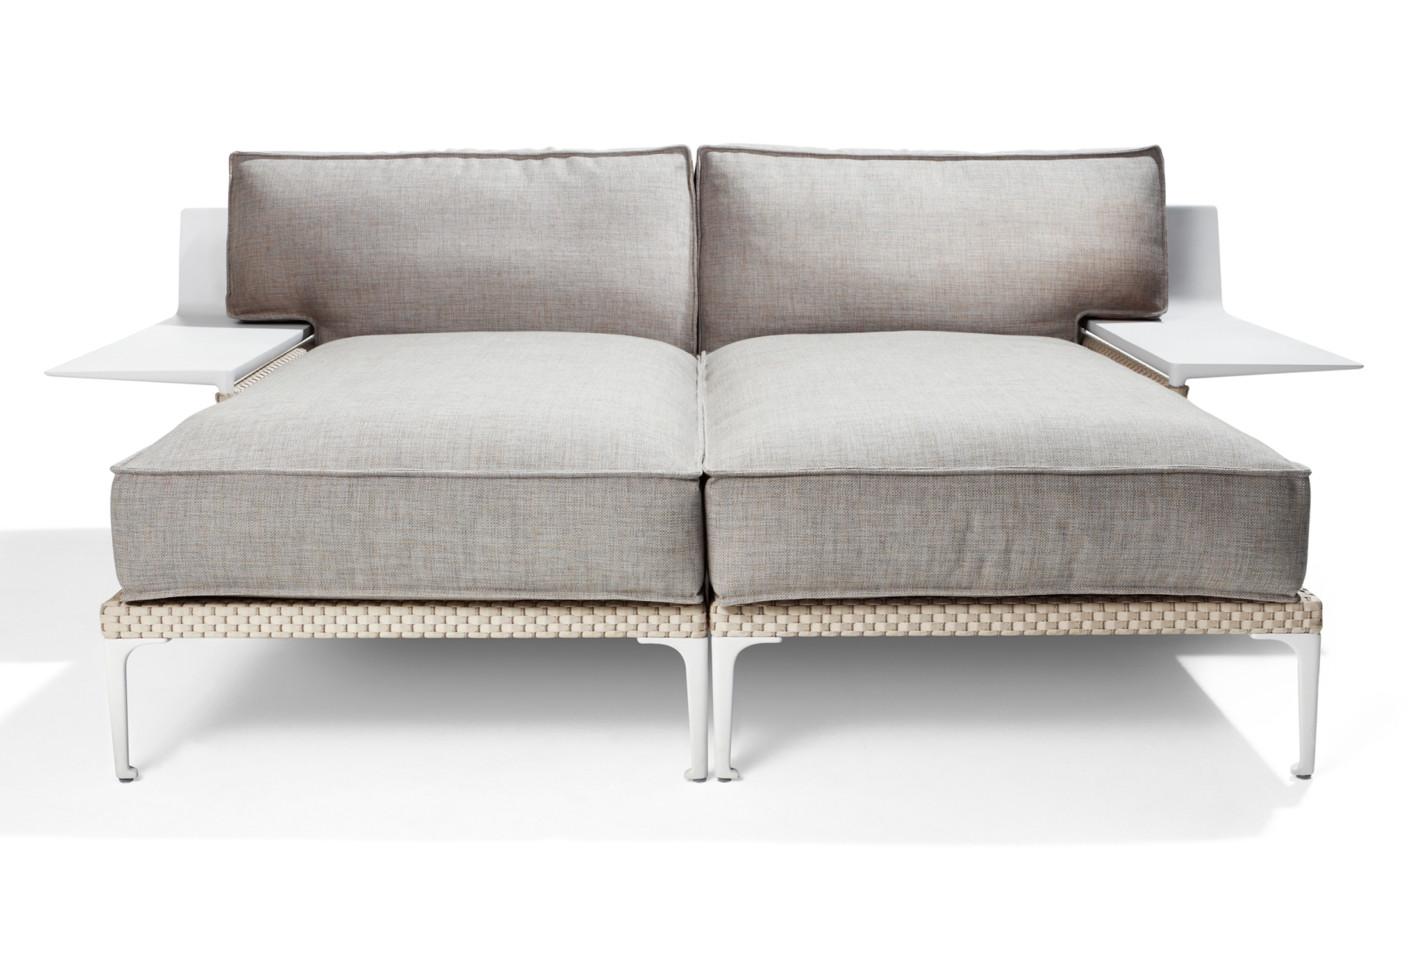 rayn tagesbett von dedon stylepark. Black Bedroom Furniture Sets. Home Design Ideas